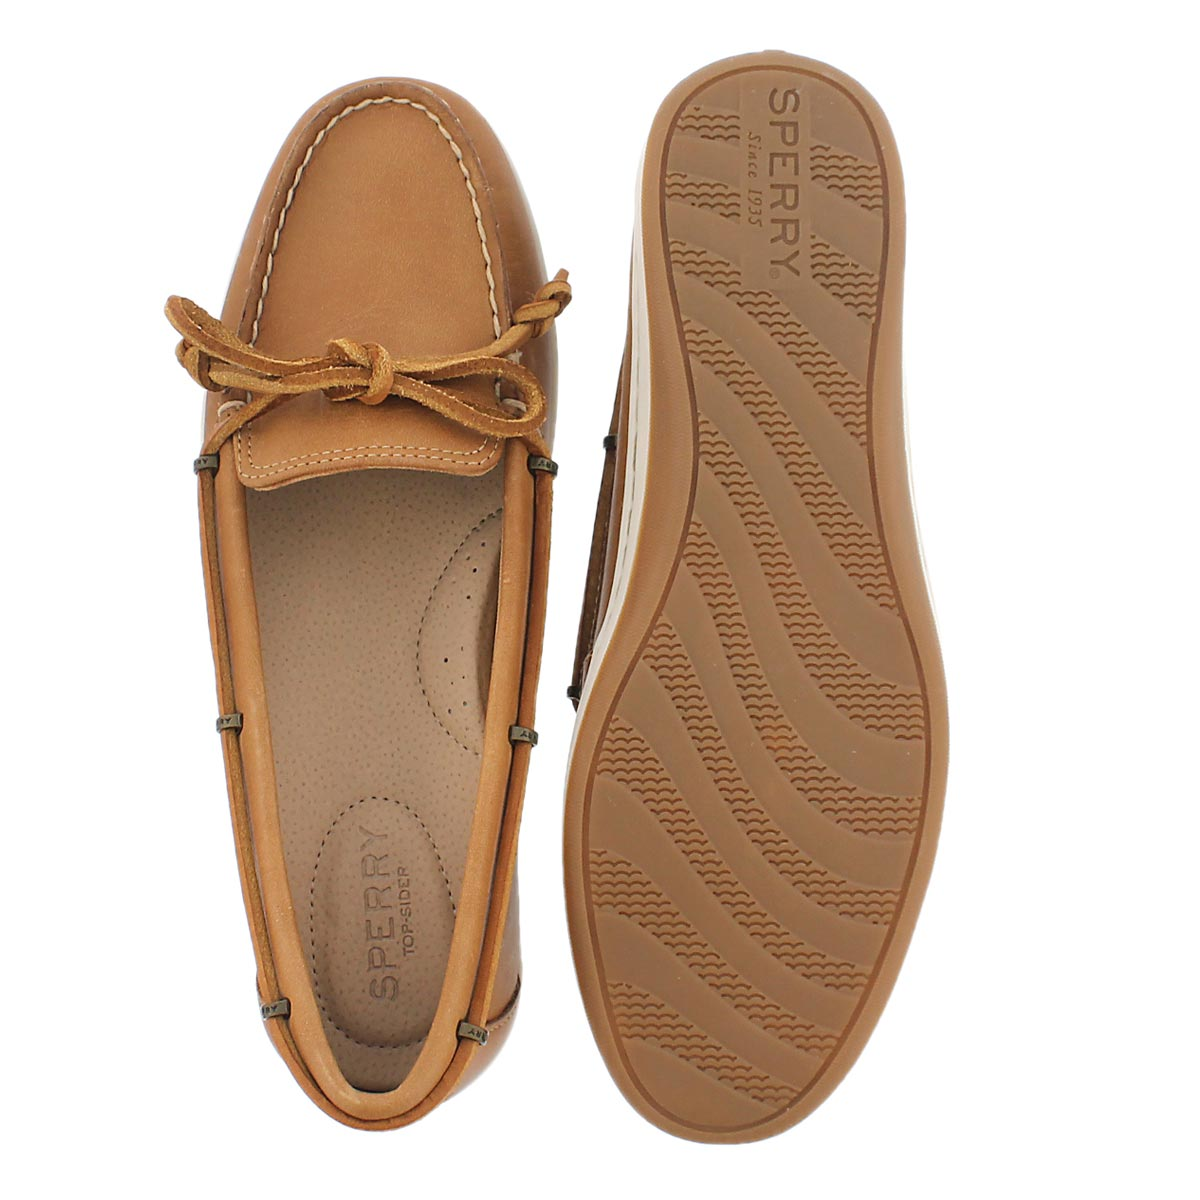 Lds Jewelfish Custom Lace tan boat shoe